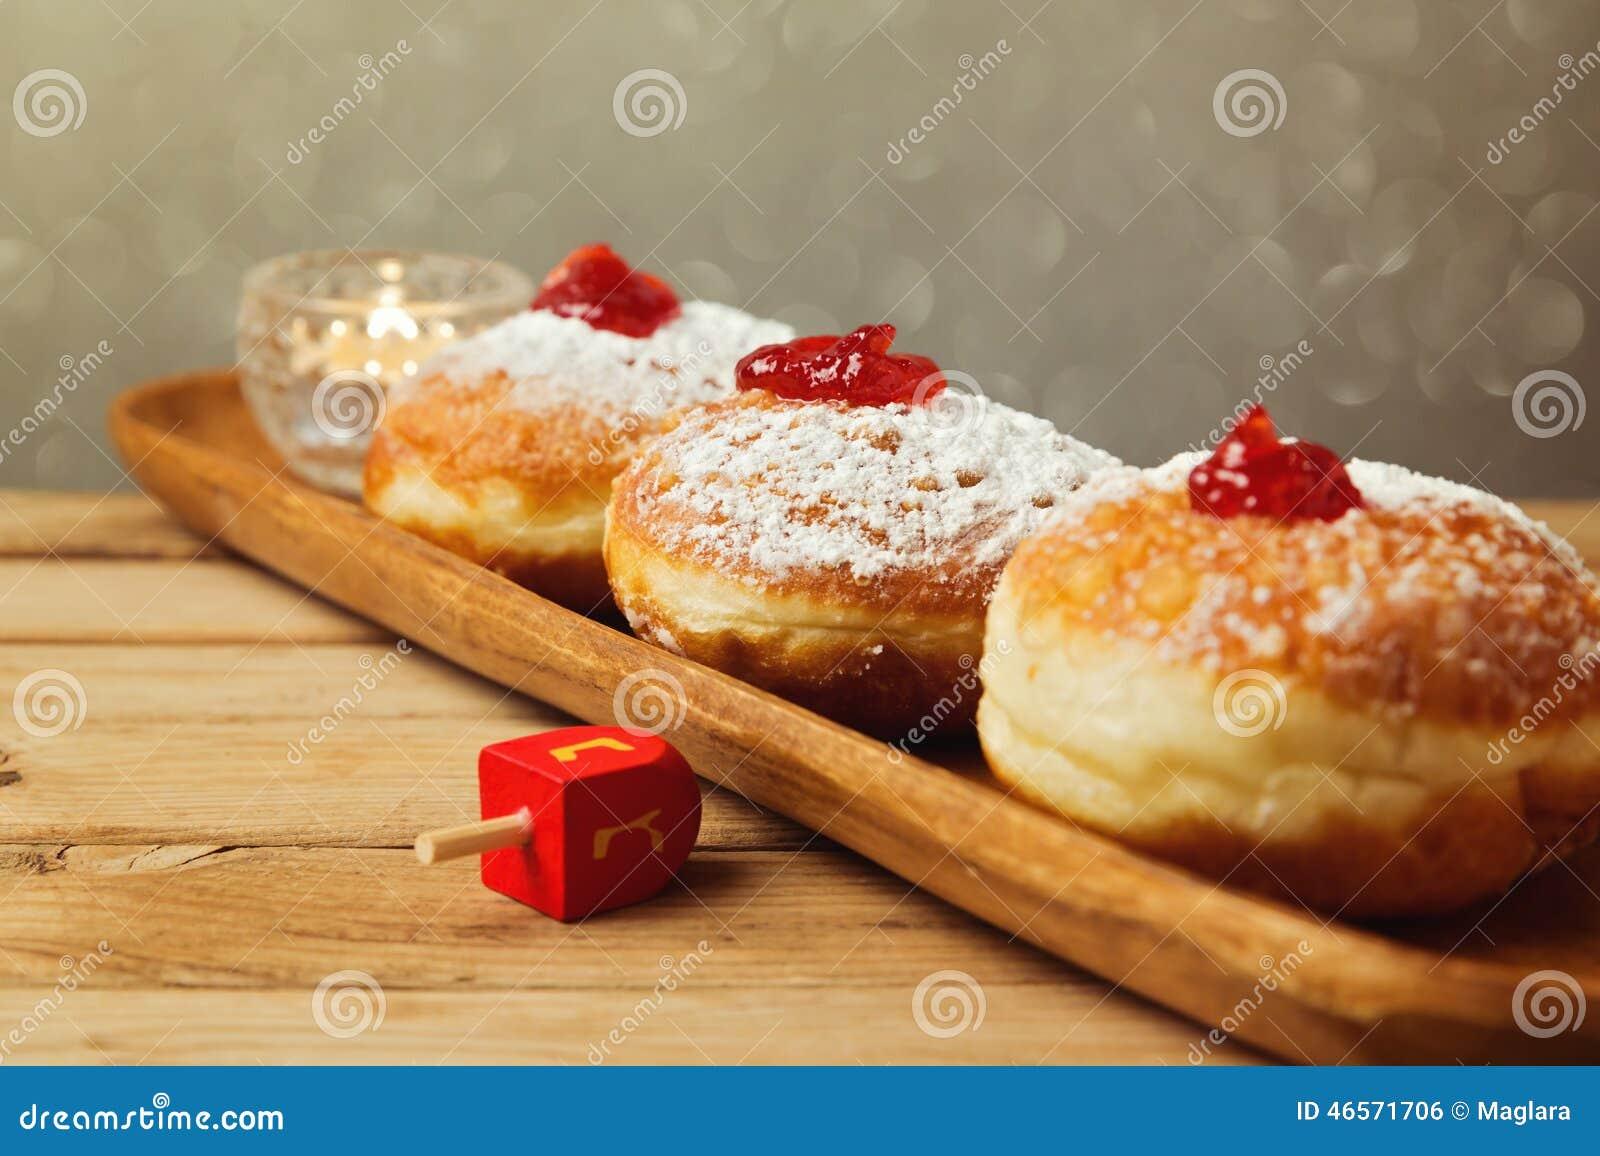 doughnuts for Jewish Holiday Hanukkah. Selective focus on the doughnut ...